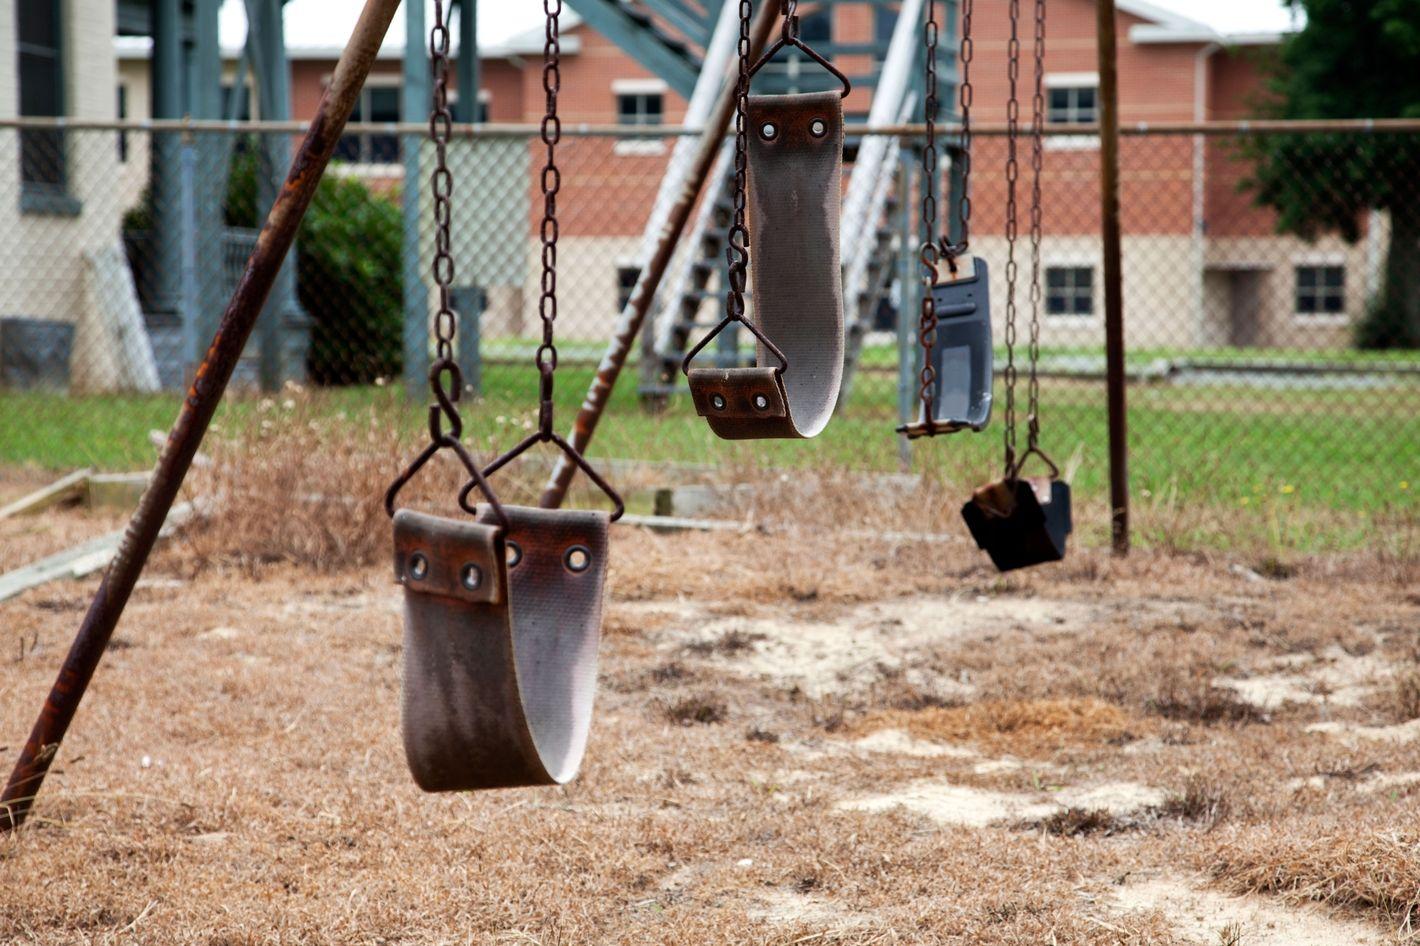 Aging Swings